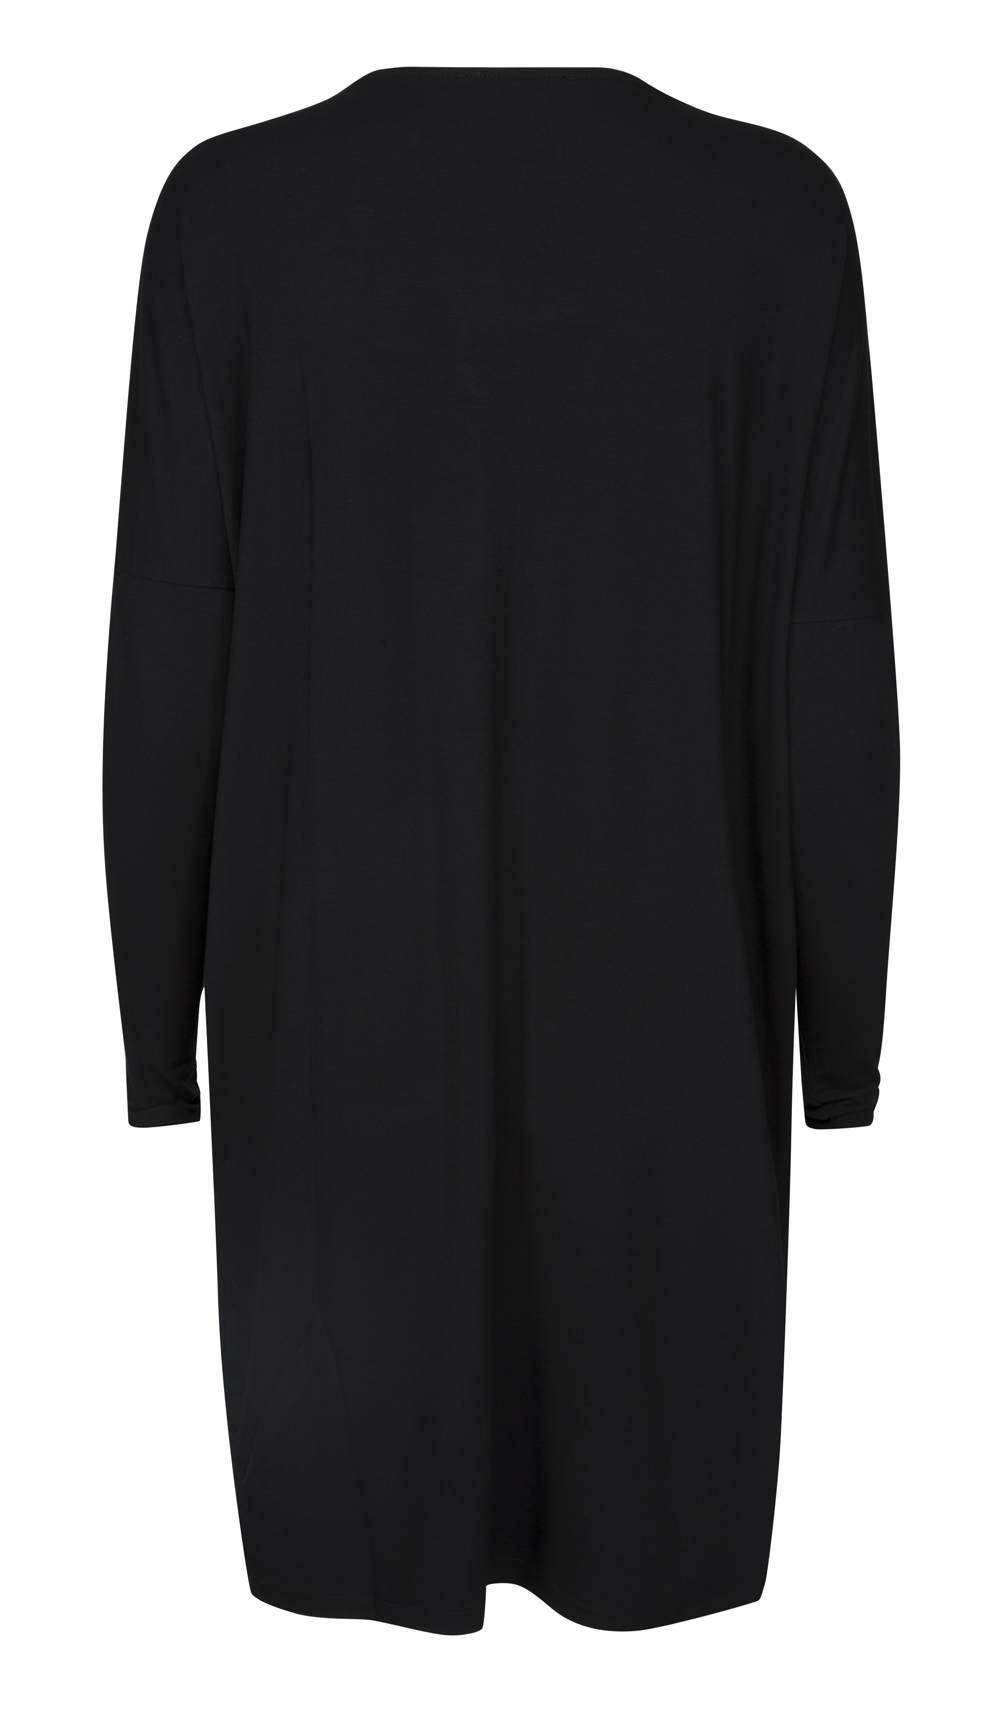 ilsejacobsen-tshirt62-oversized-tunika-svart